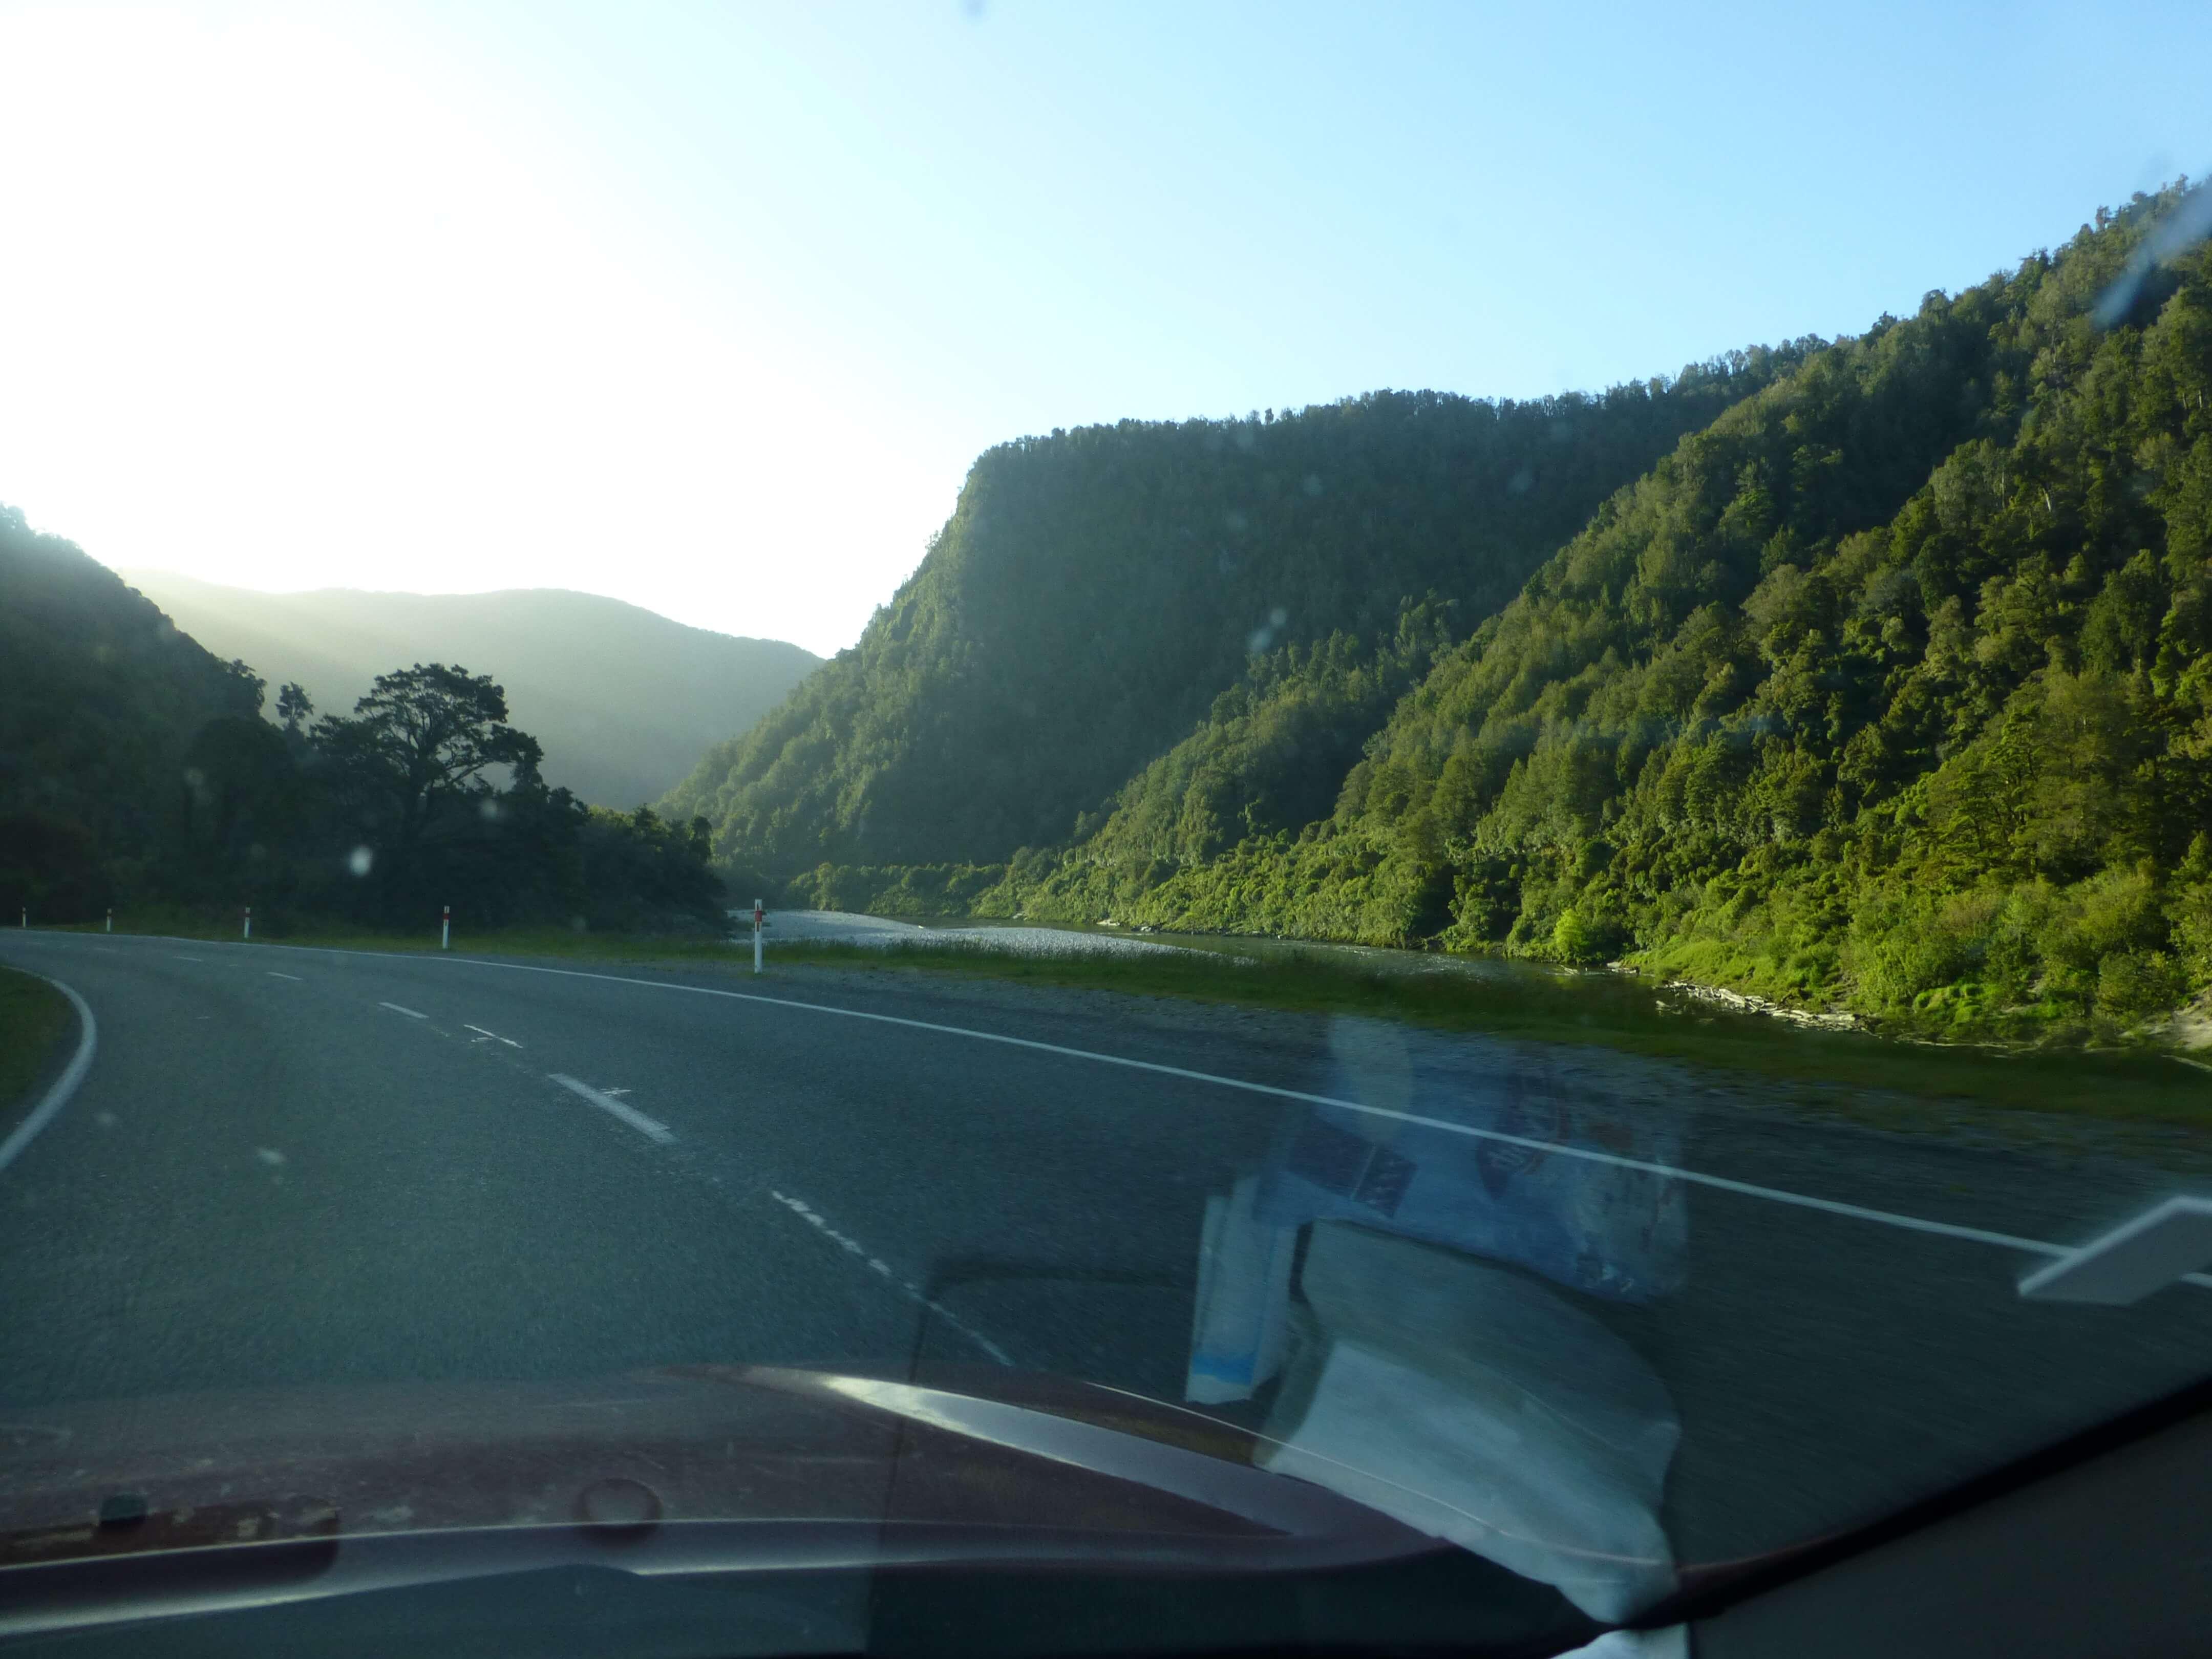 am Kilkenny Lookout, S6, Buller River, NZ 5